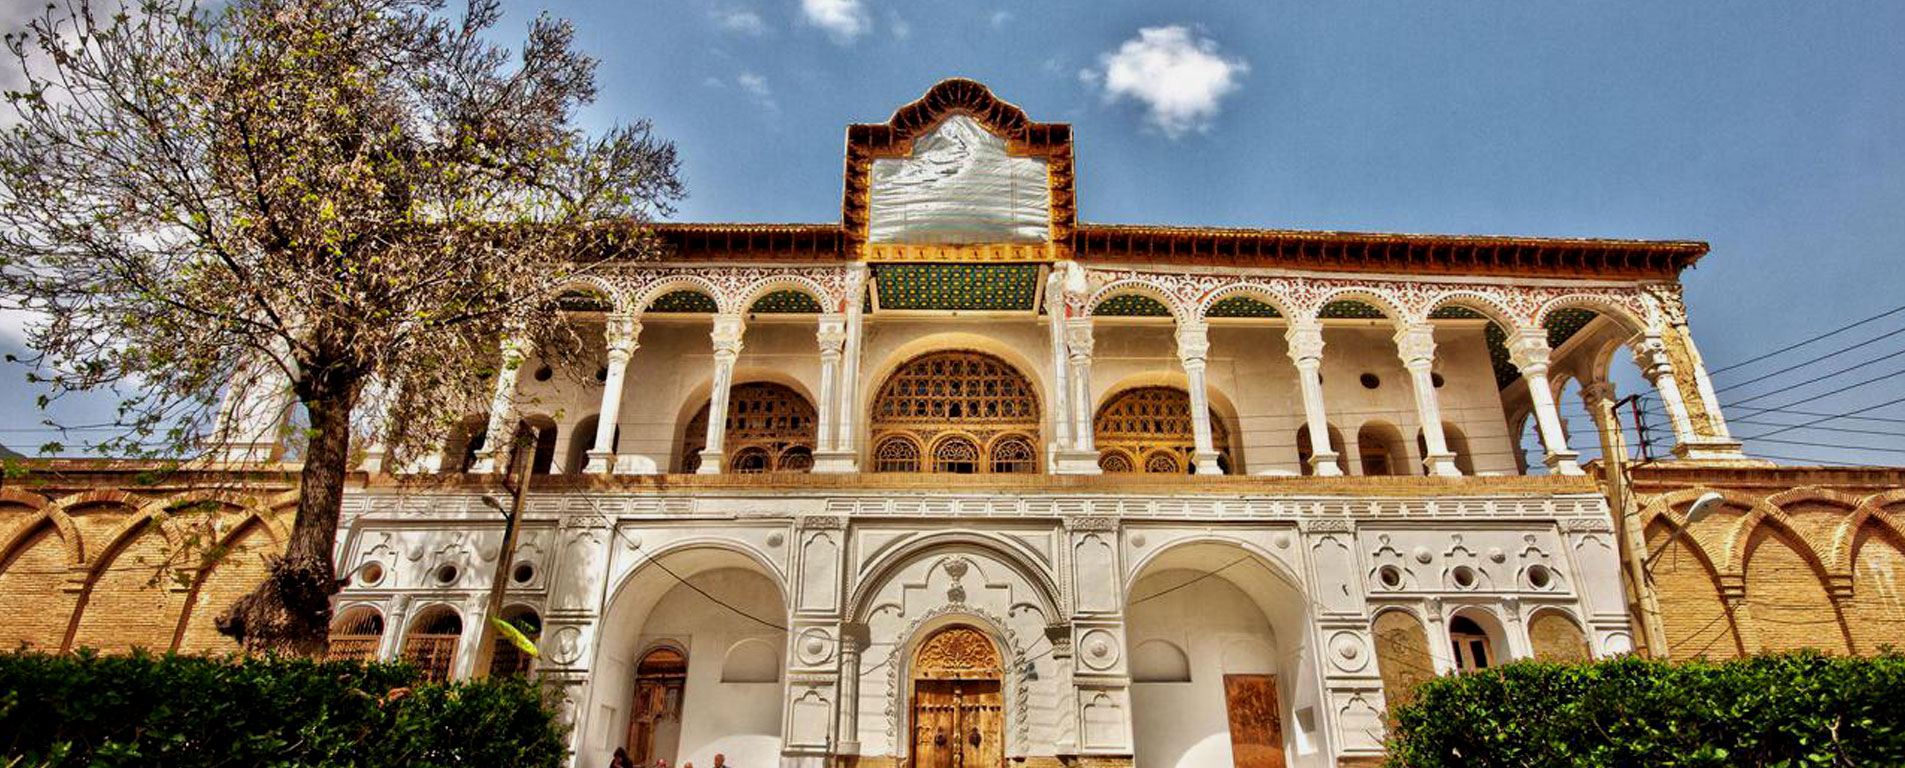 عمارت خسرو آباد ، کاخی قاجاری در سنندج